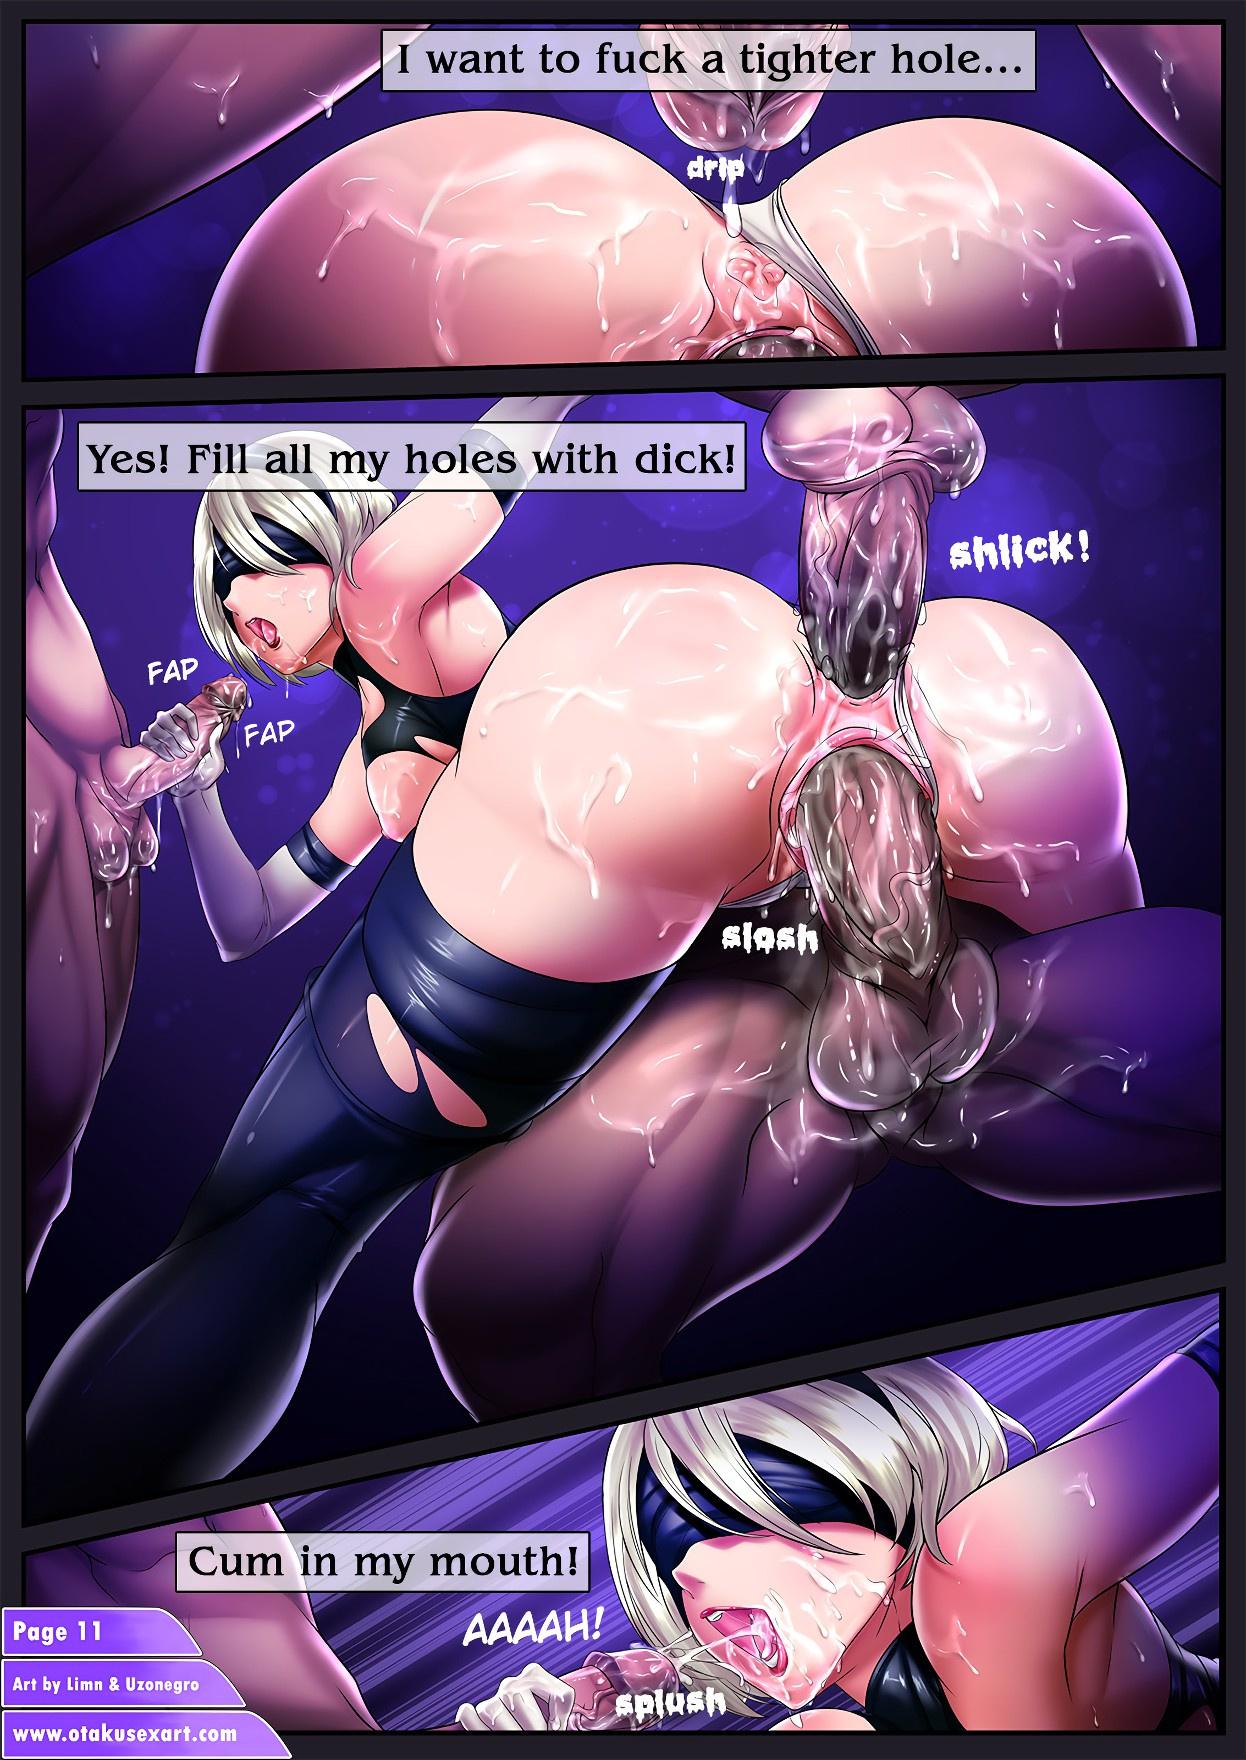 Nier Autofellatio 2: Cumslut Automata porn comics Oral sex, Anal Sex, Blowjob, Creampie, Cum Shots, Cum Swallow, Double Penetration, Gangbang, Group Sex, Masturbation, Stockings, Straight, Threesome, X-Ray